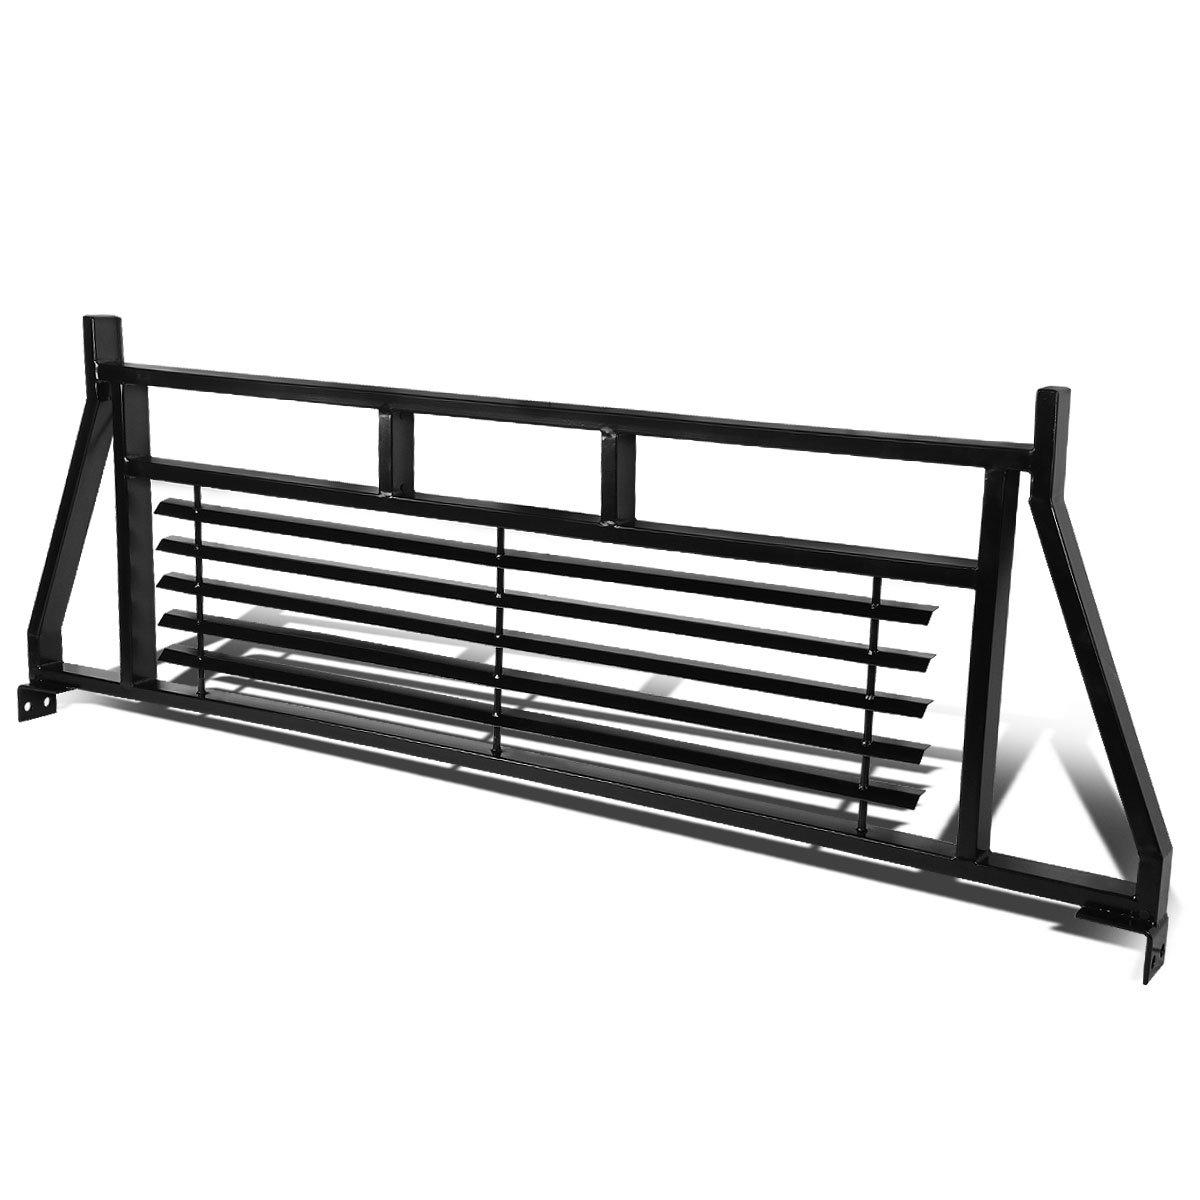 For Chevy Silverado/Ford F150 / GMC Sierra/Tundra Pickup Truck Headache Rack Cab Guard Frame Window Protector